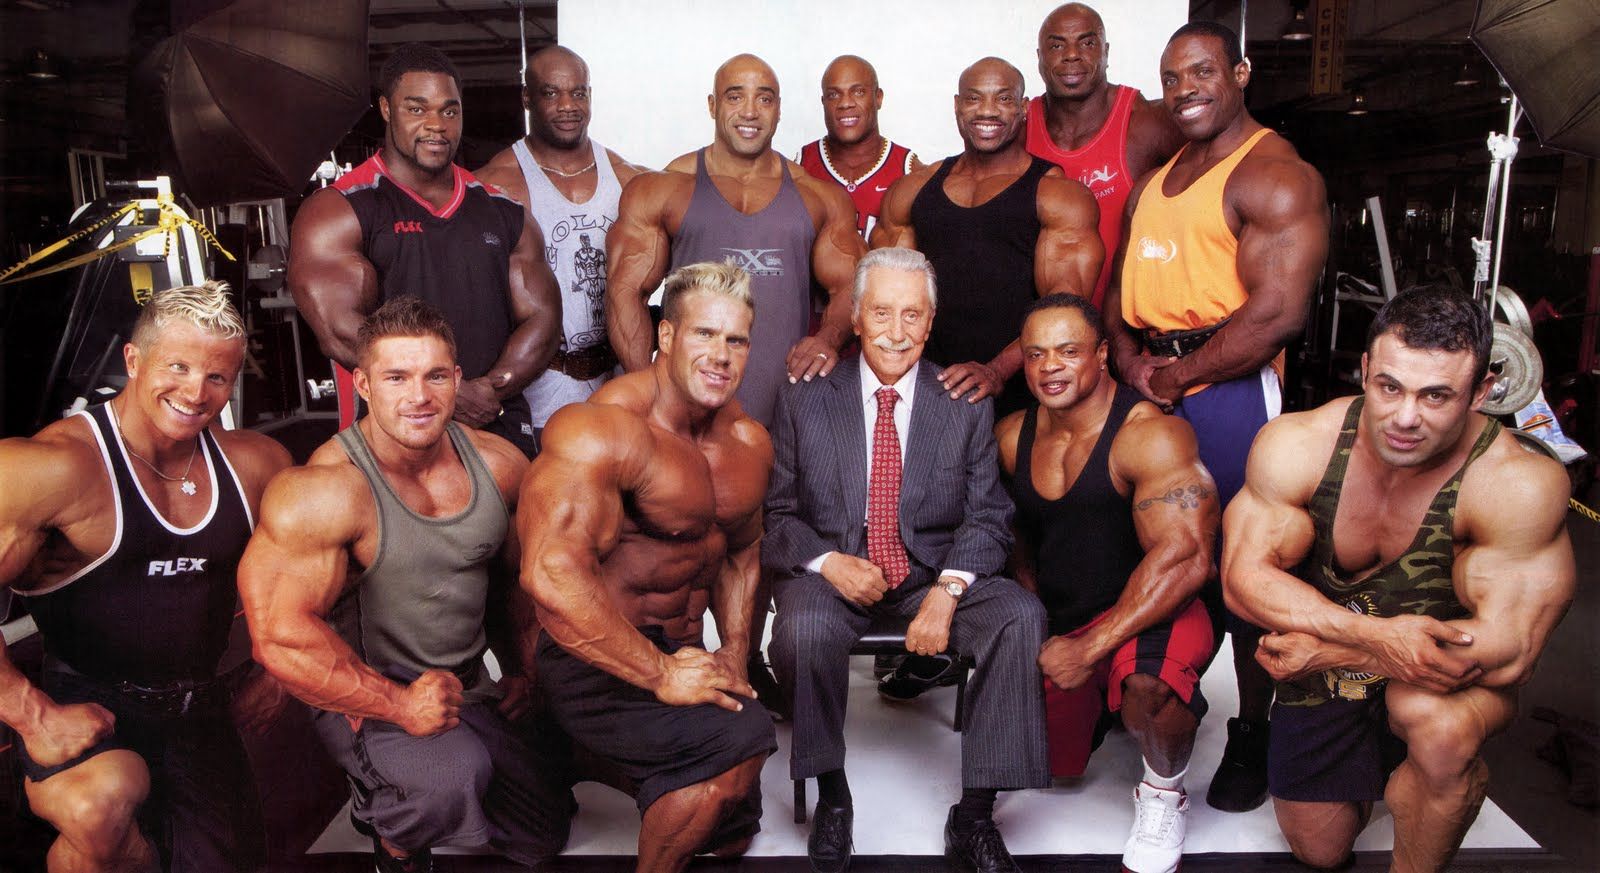 Bodybuilding Group 12